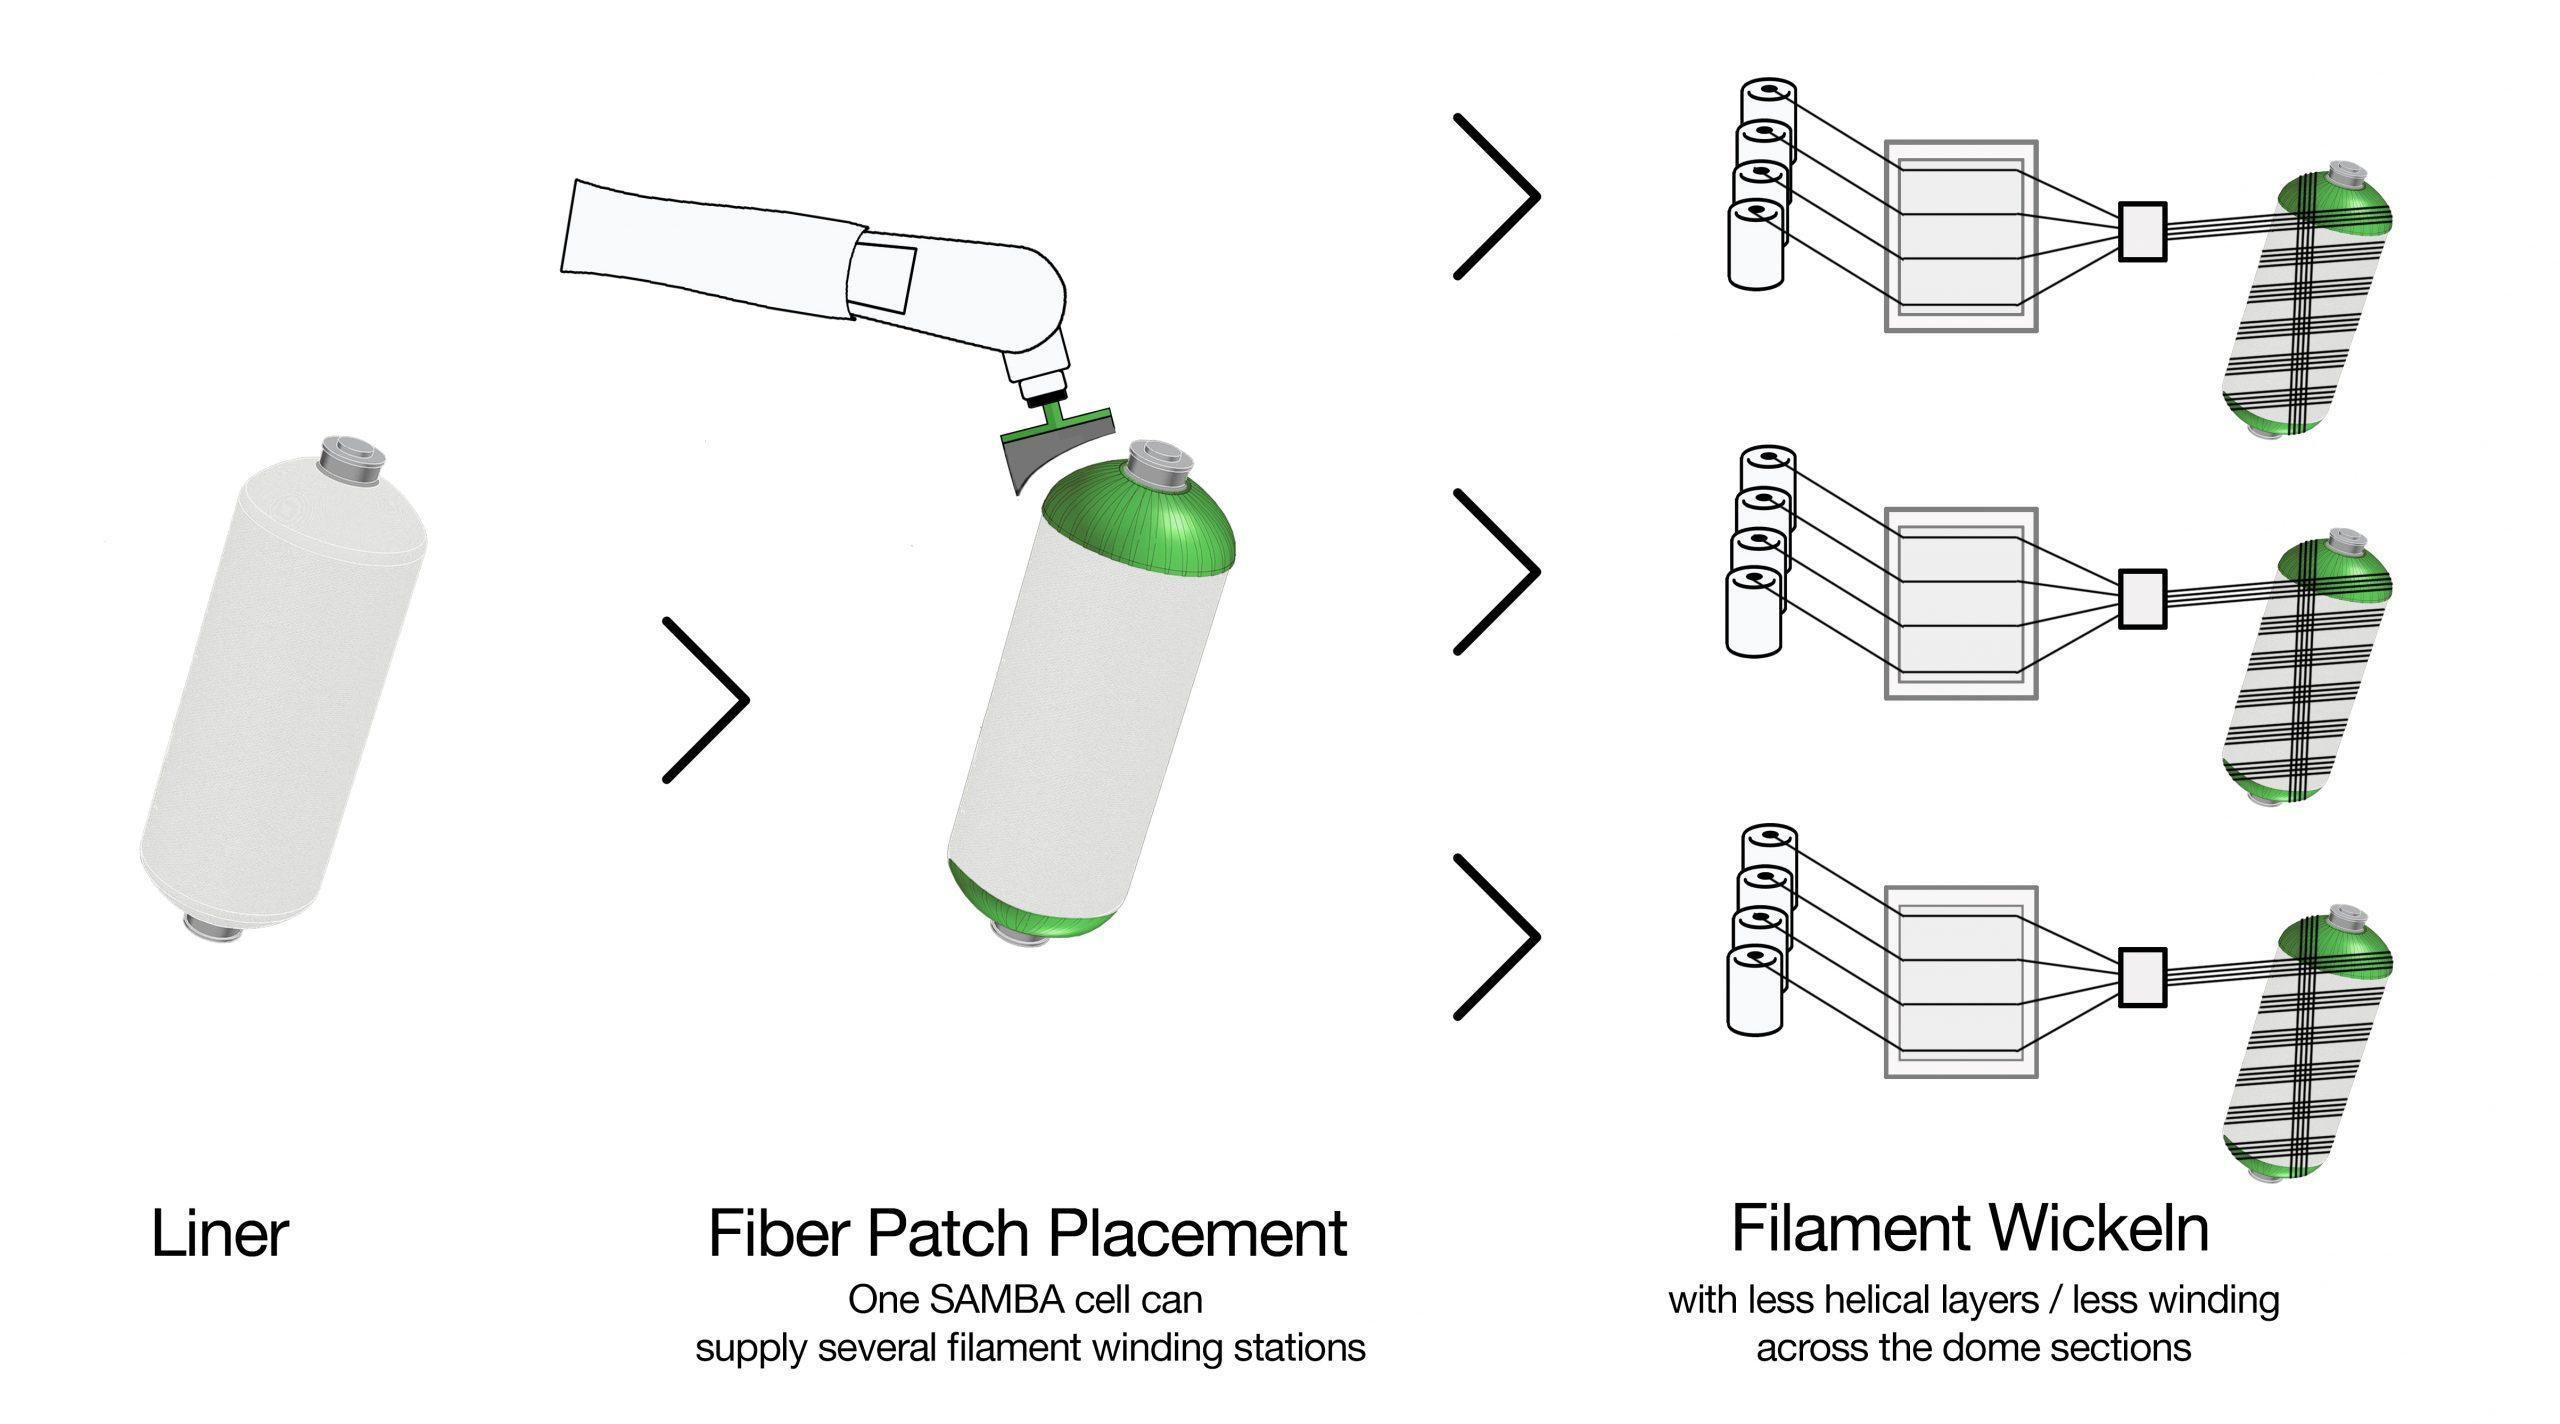 H2 tank FPP and Filament winding process